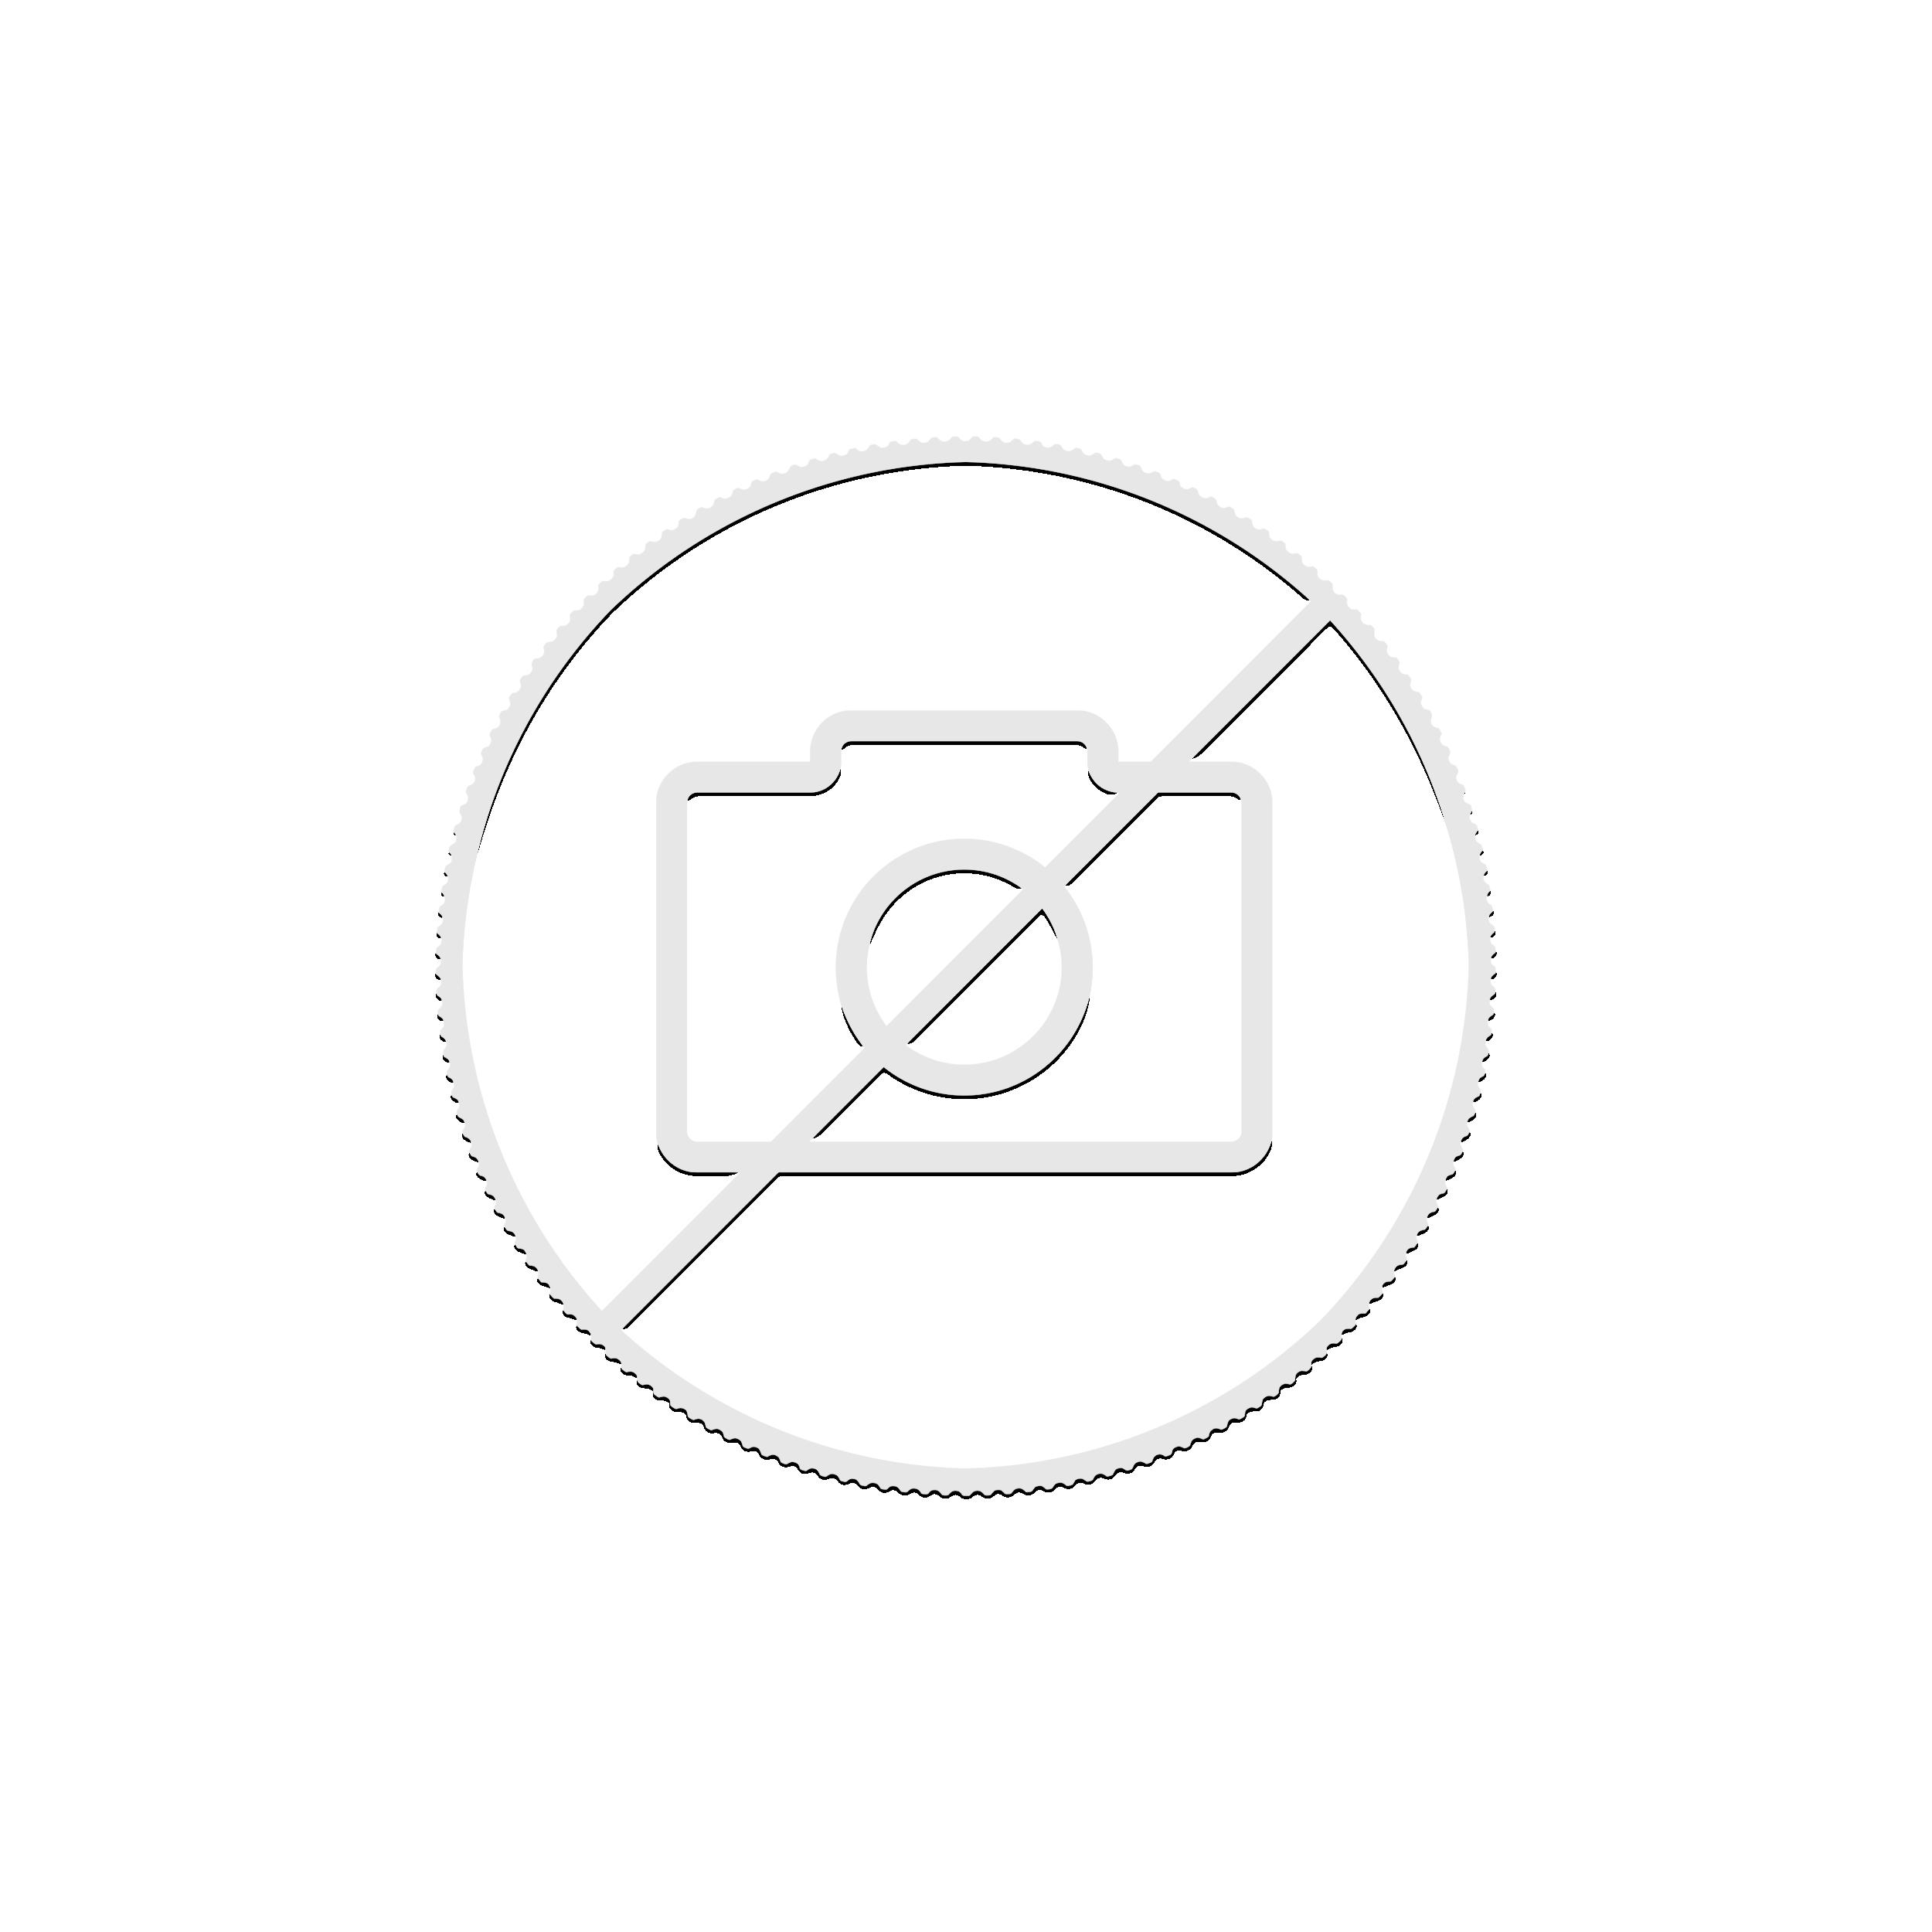 1 troy ounce zilveren munt Googly Eyes 2021